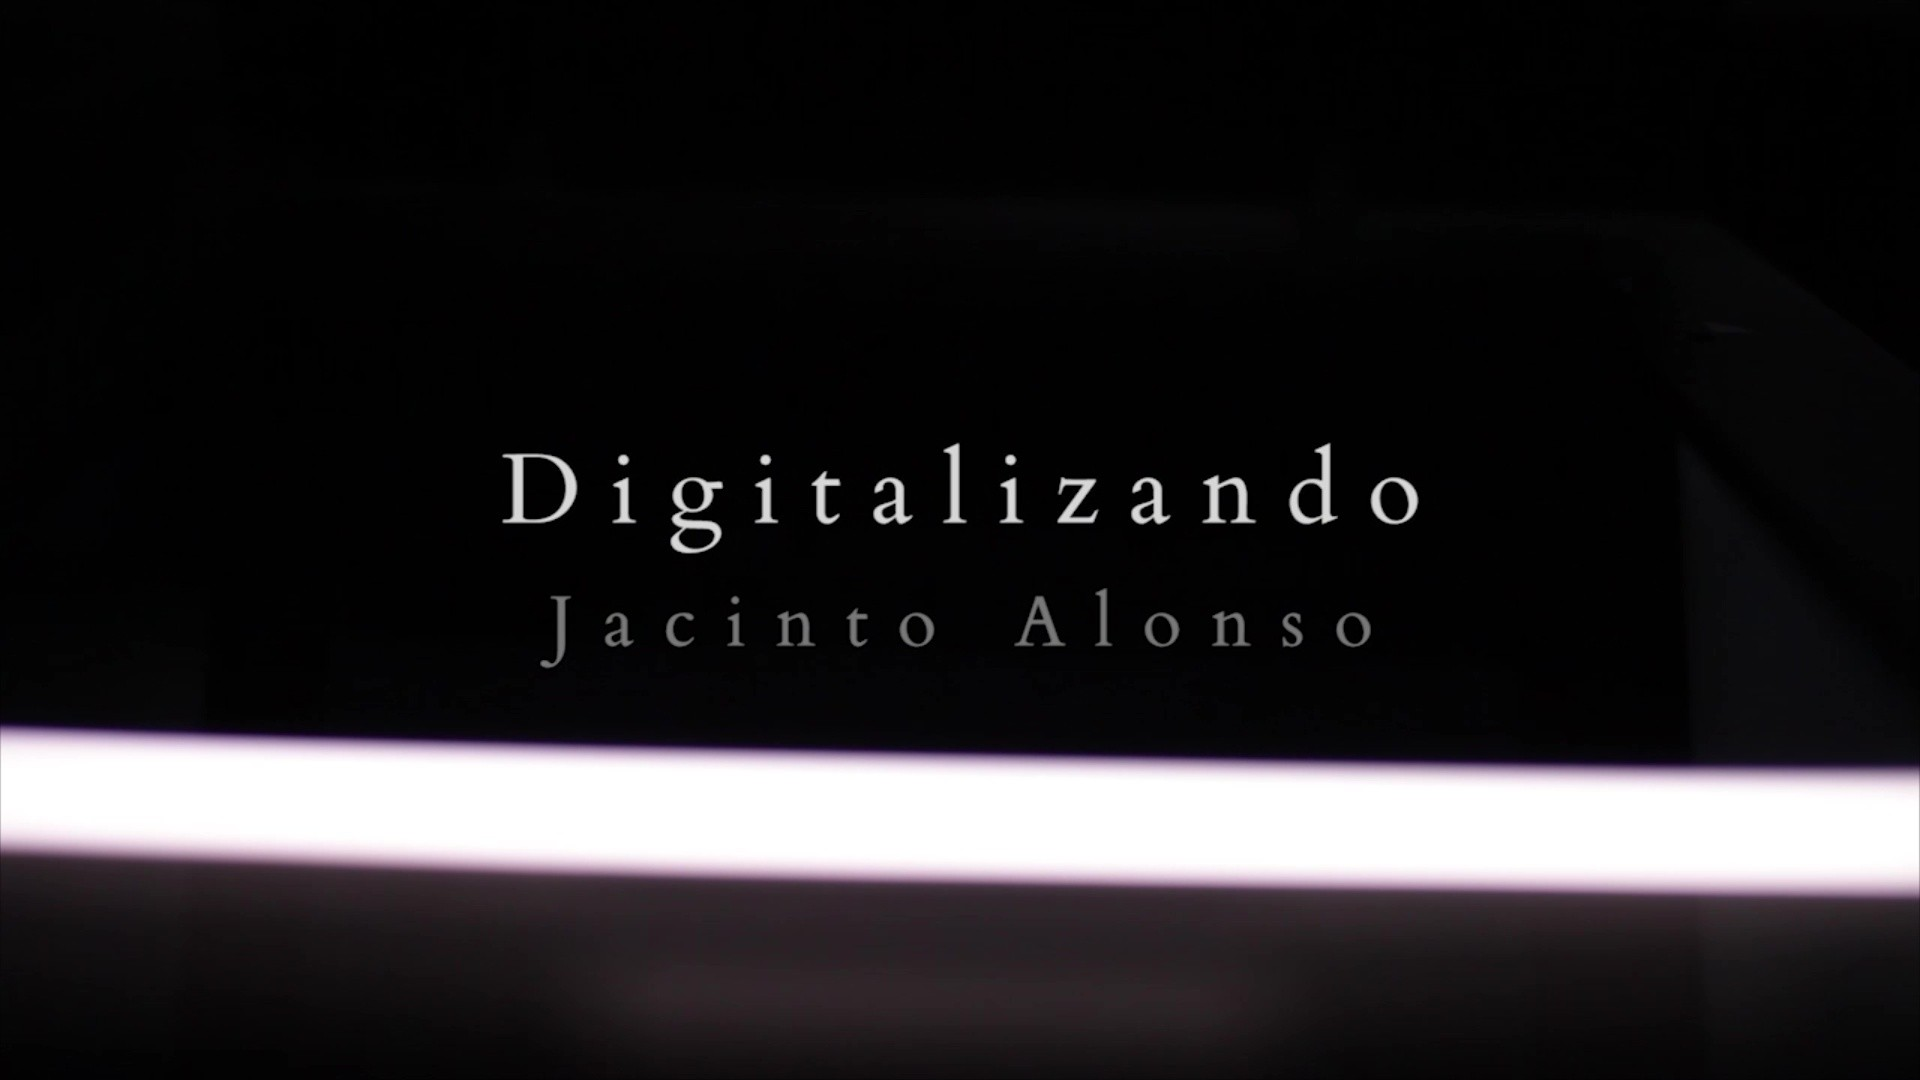 Digitalizando Jacinto Alonso (2015)